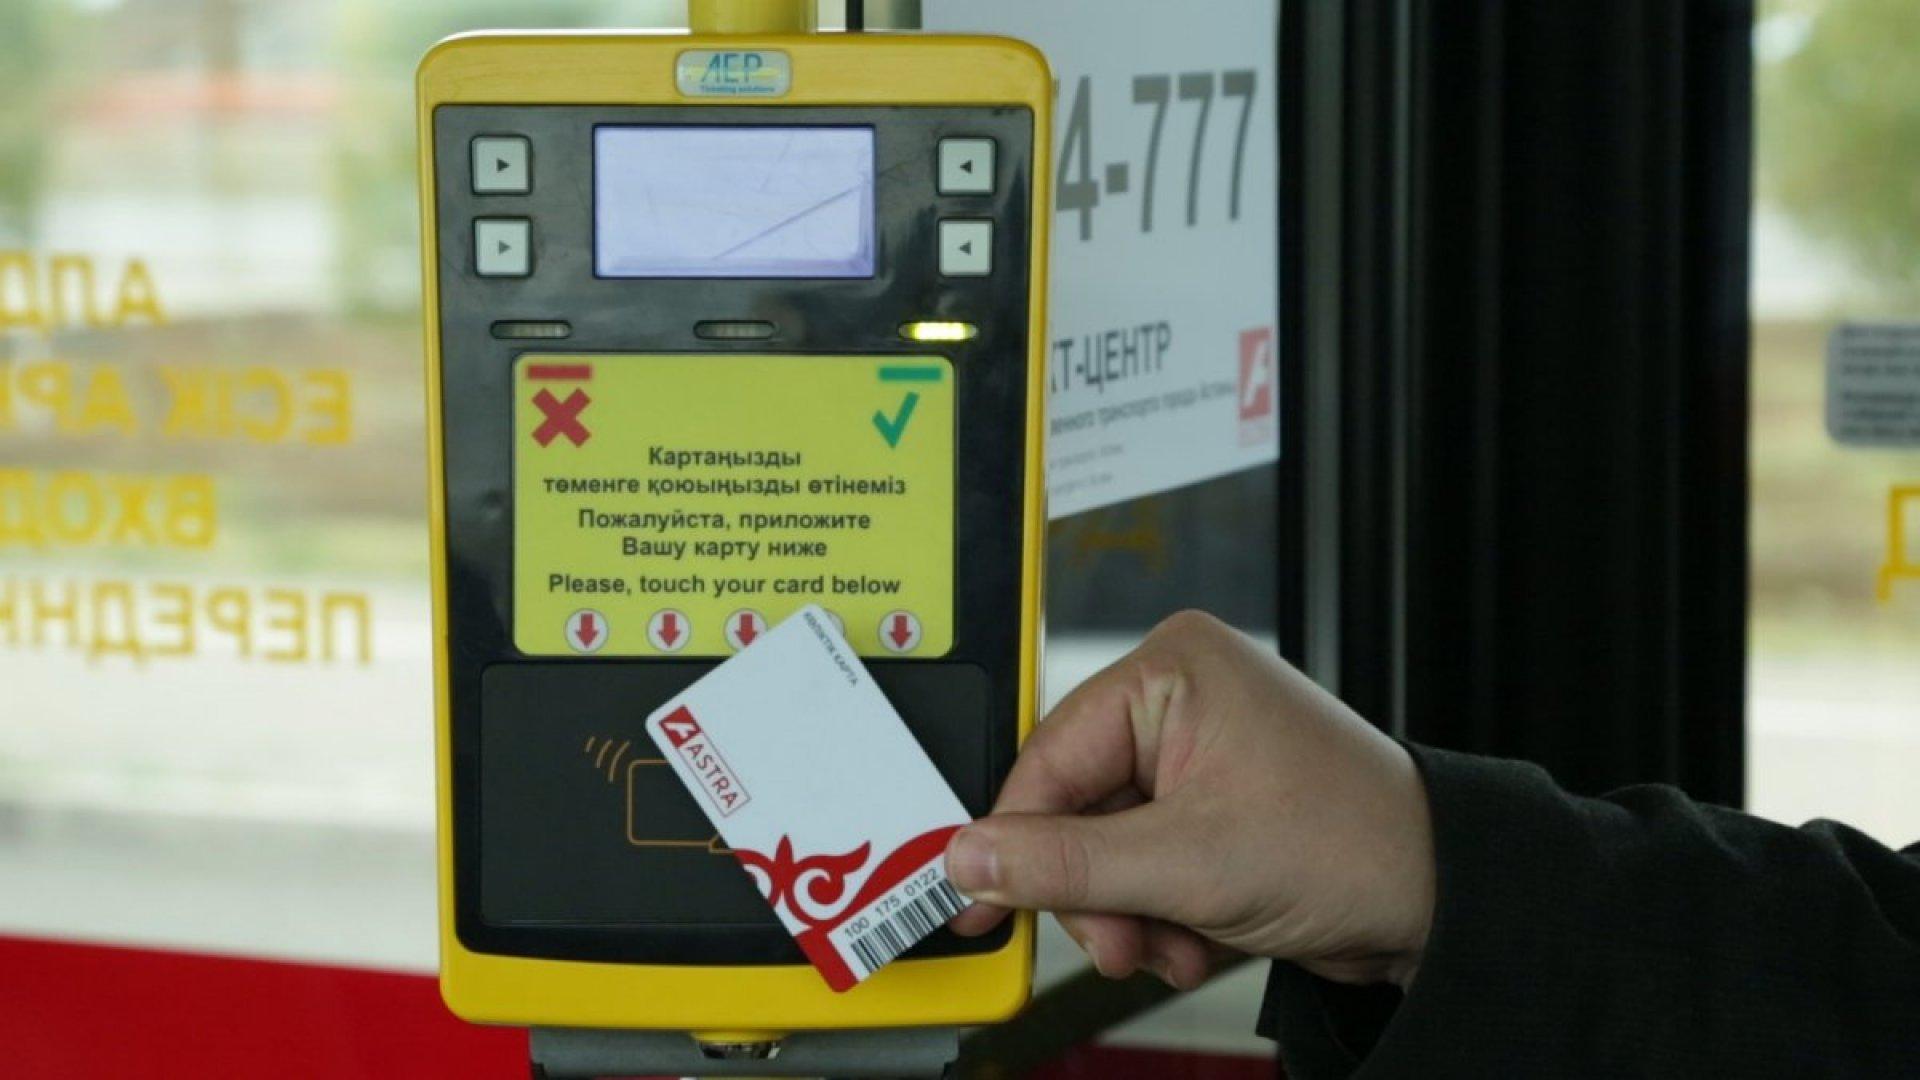 Карточки оплаты проезда